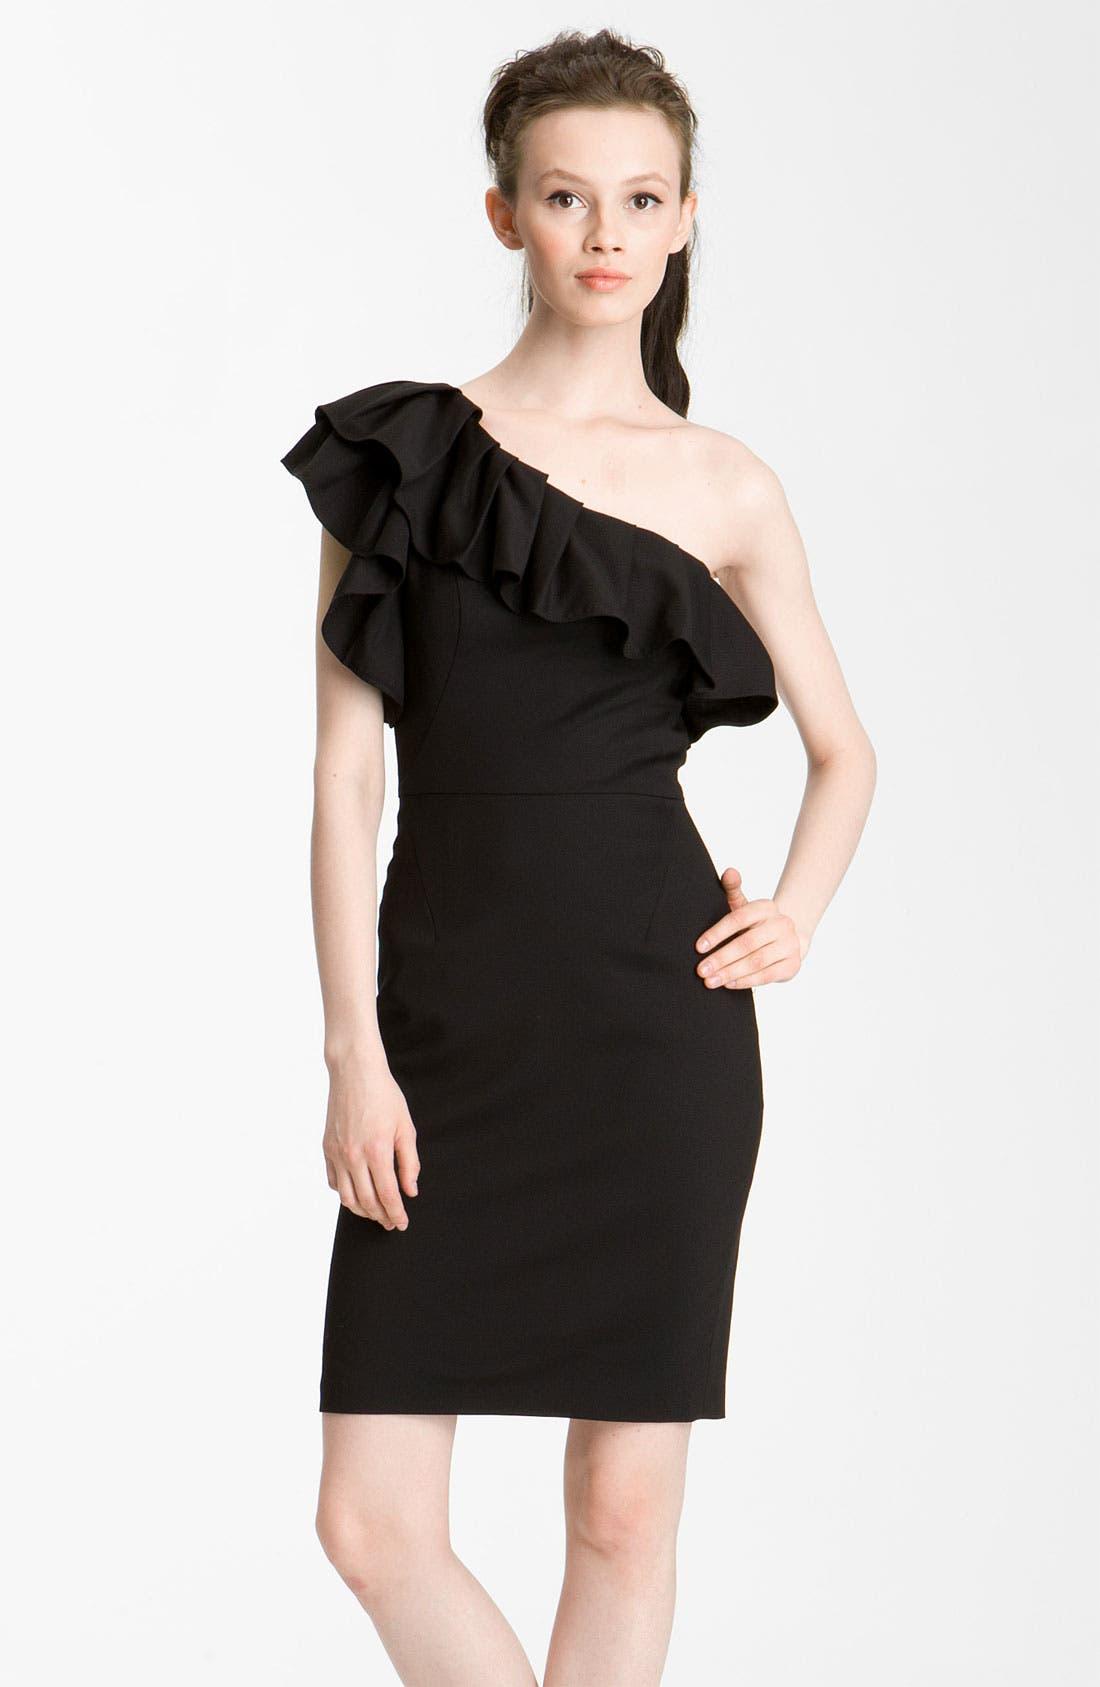 Alternate Image 1 Selected - Rachel Zoe 'Isabelle II' One Shoulder Ruffle Dress